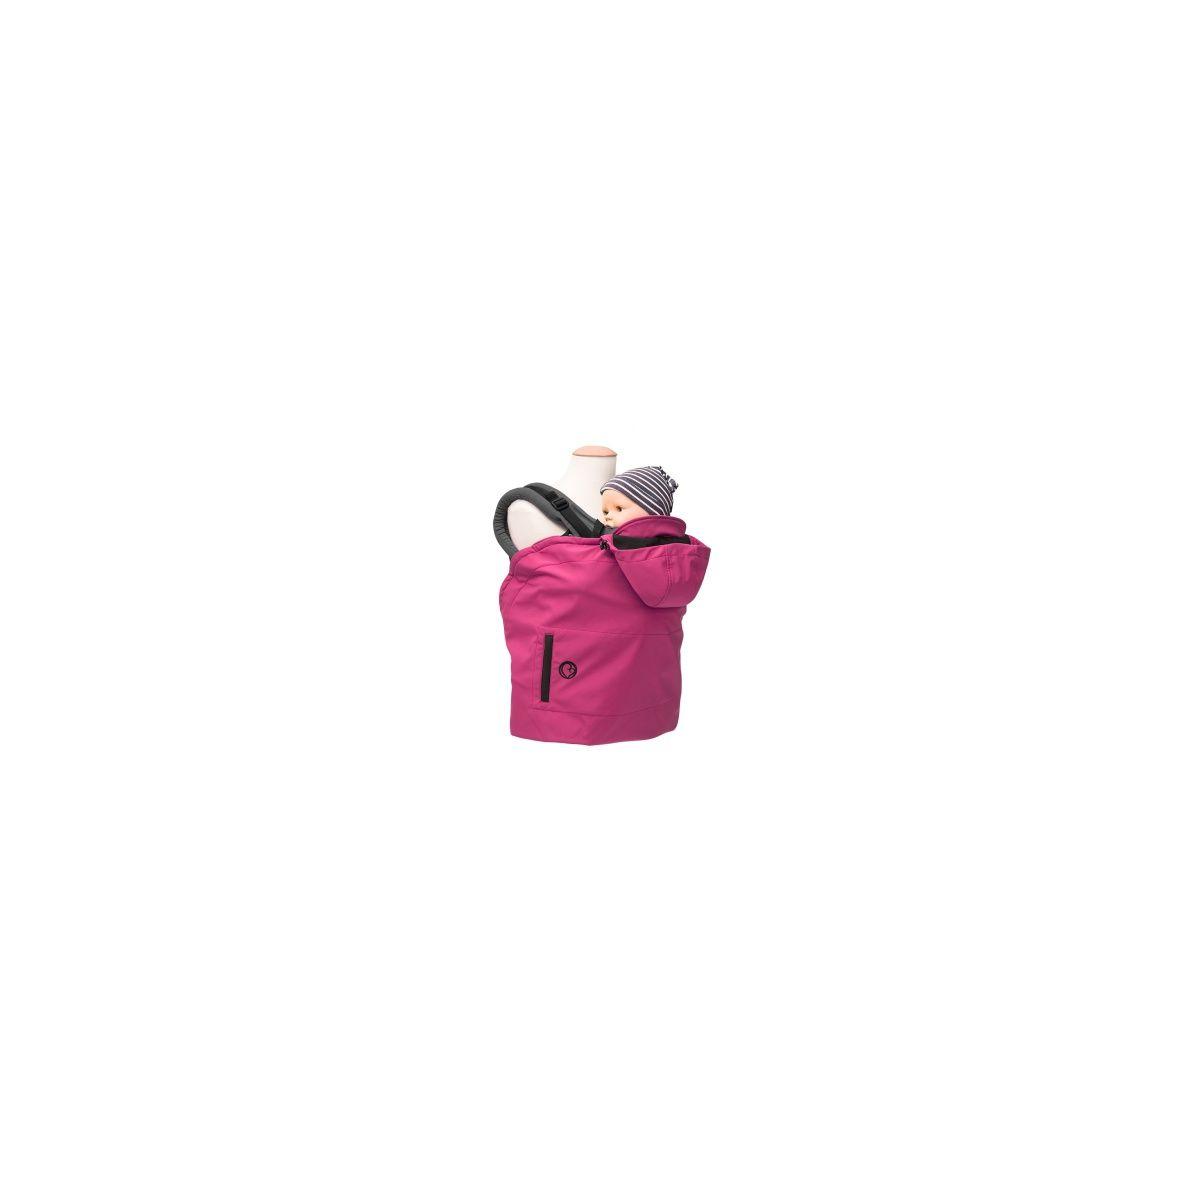 5d0f7efe97a0 Couverture de portage Evolutive Softshell Framboise   (Mamalila)